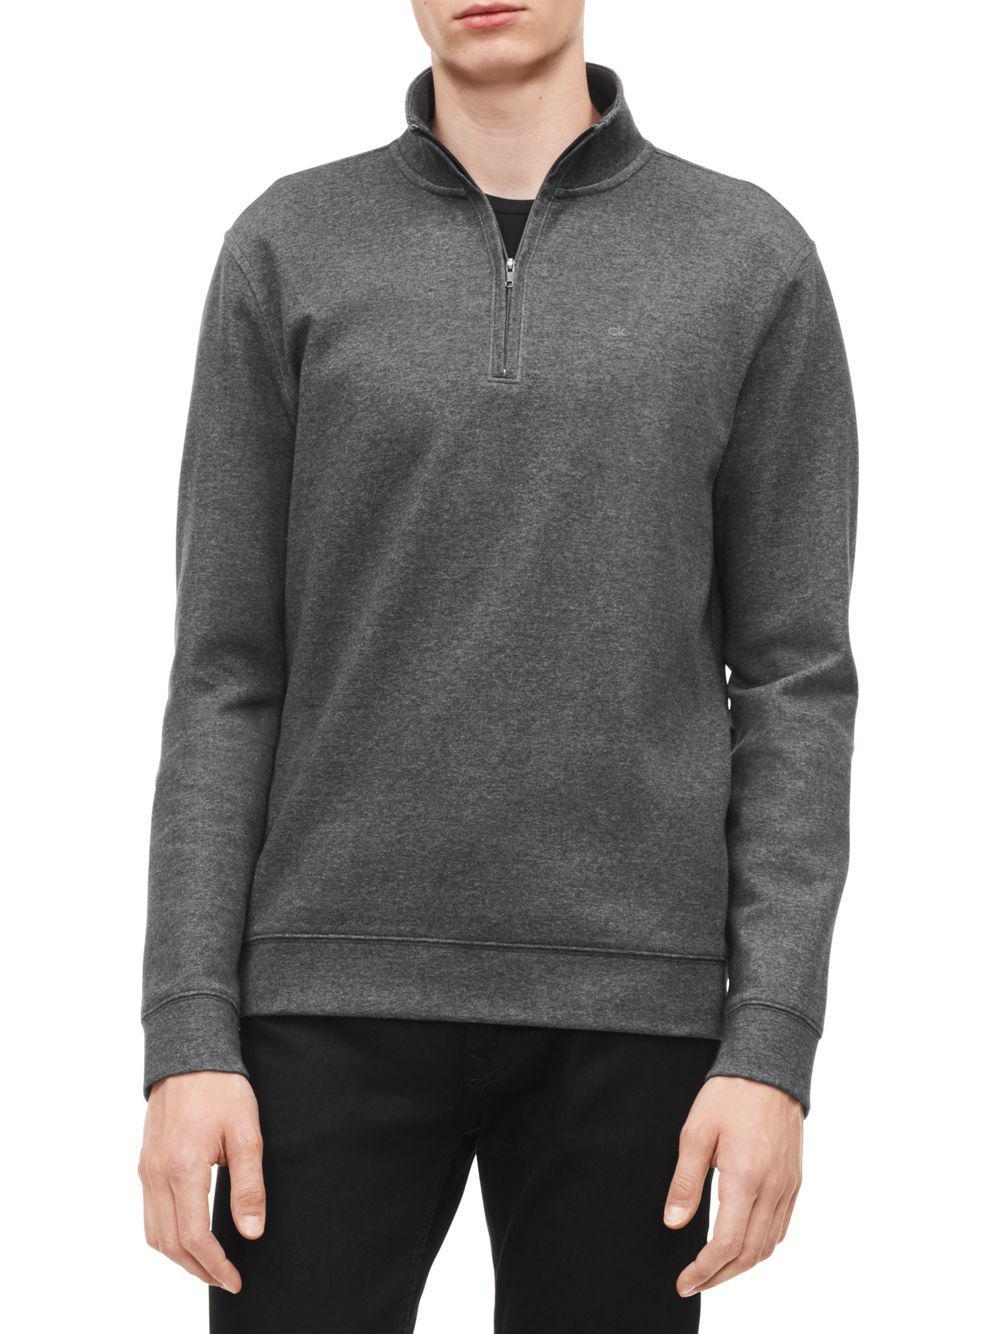 110684d951ab1 Calvin Klein The Classic Quarter-zip Sweater in Gray for Men - Lyst